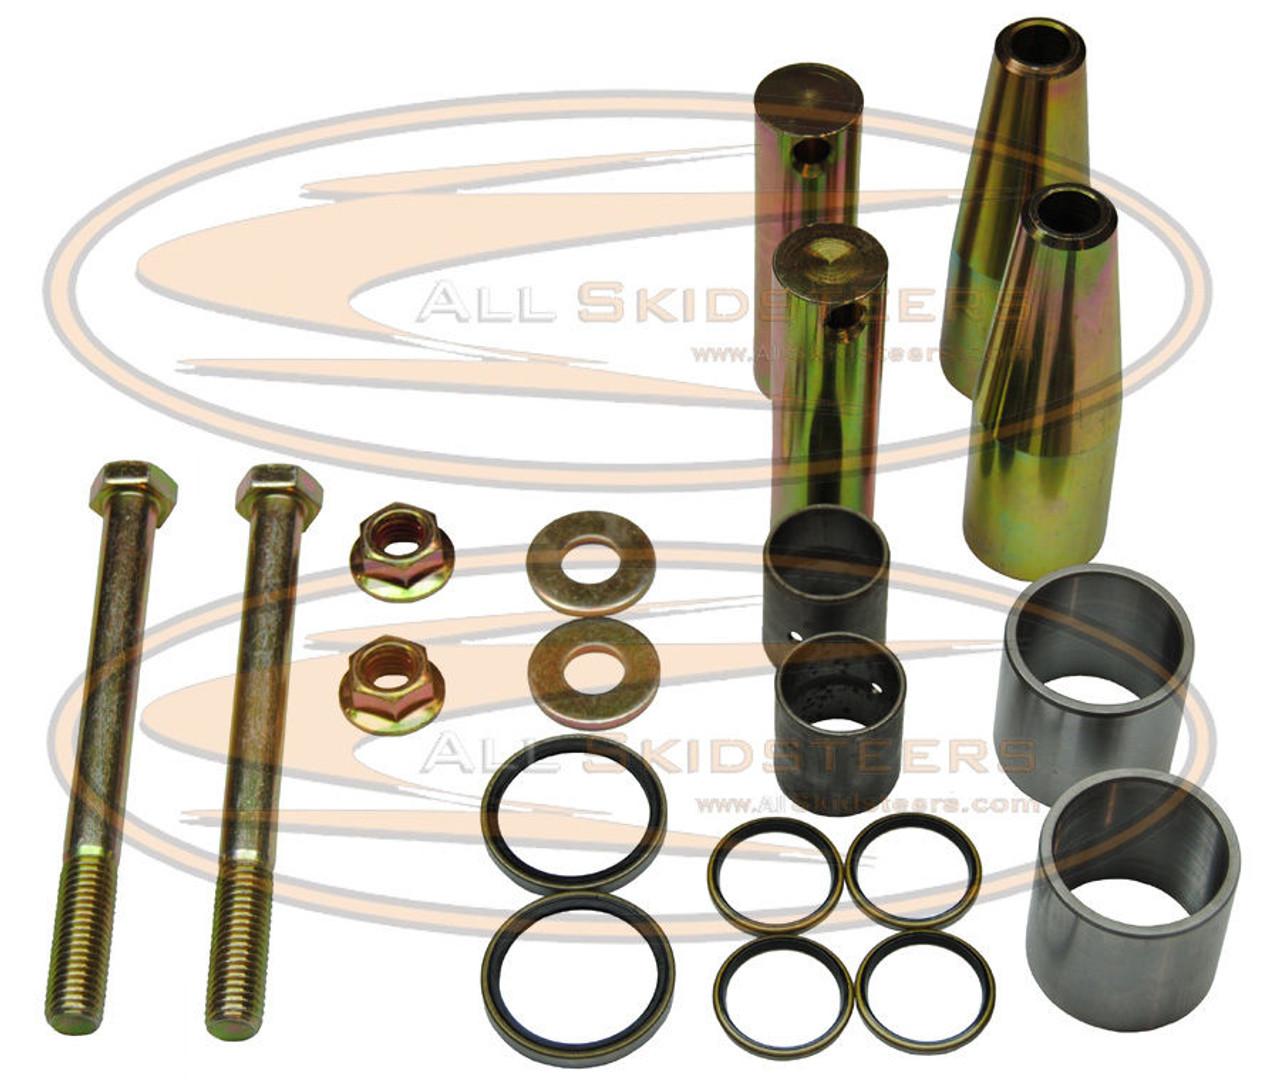 medium resolution of d e c bobcat bobtac bolt bushing frame kit large nut pin washer